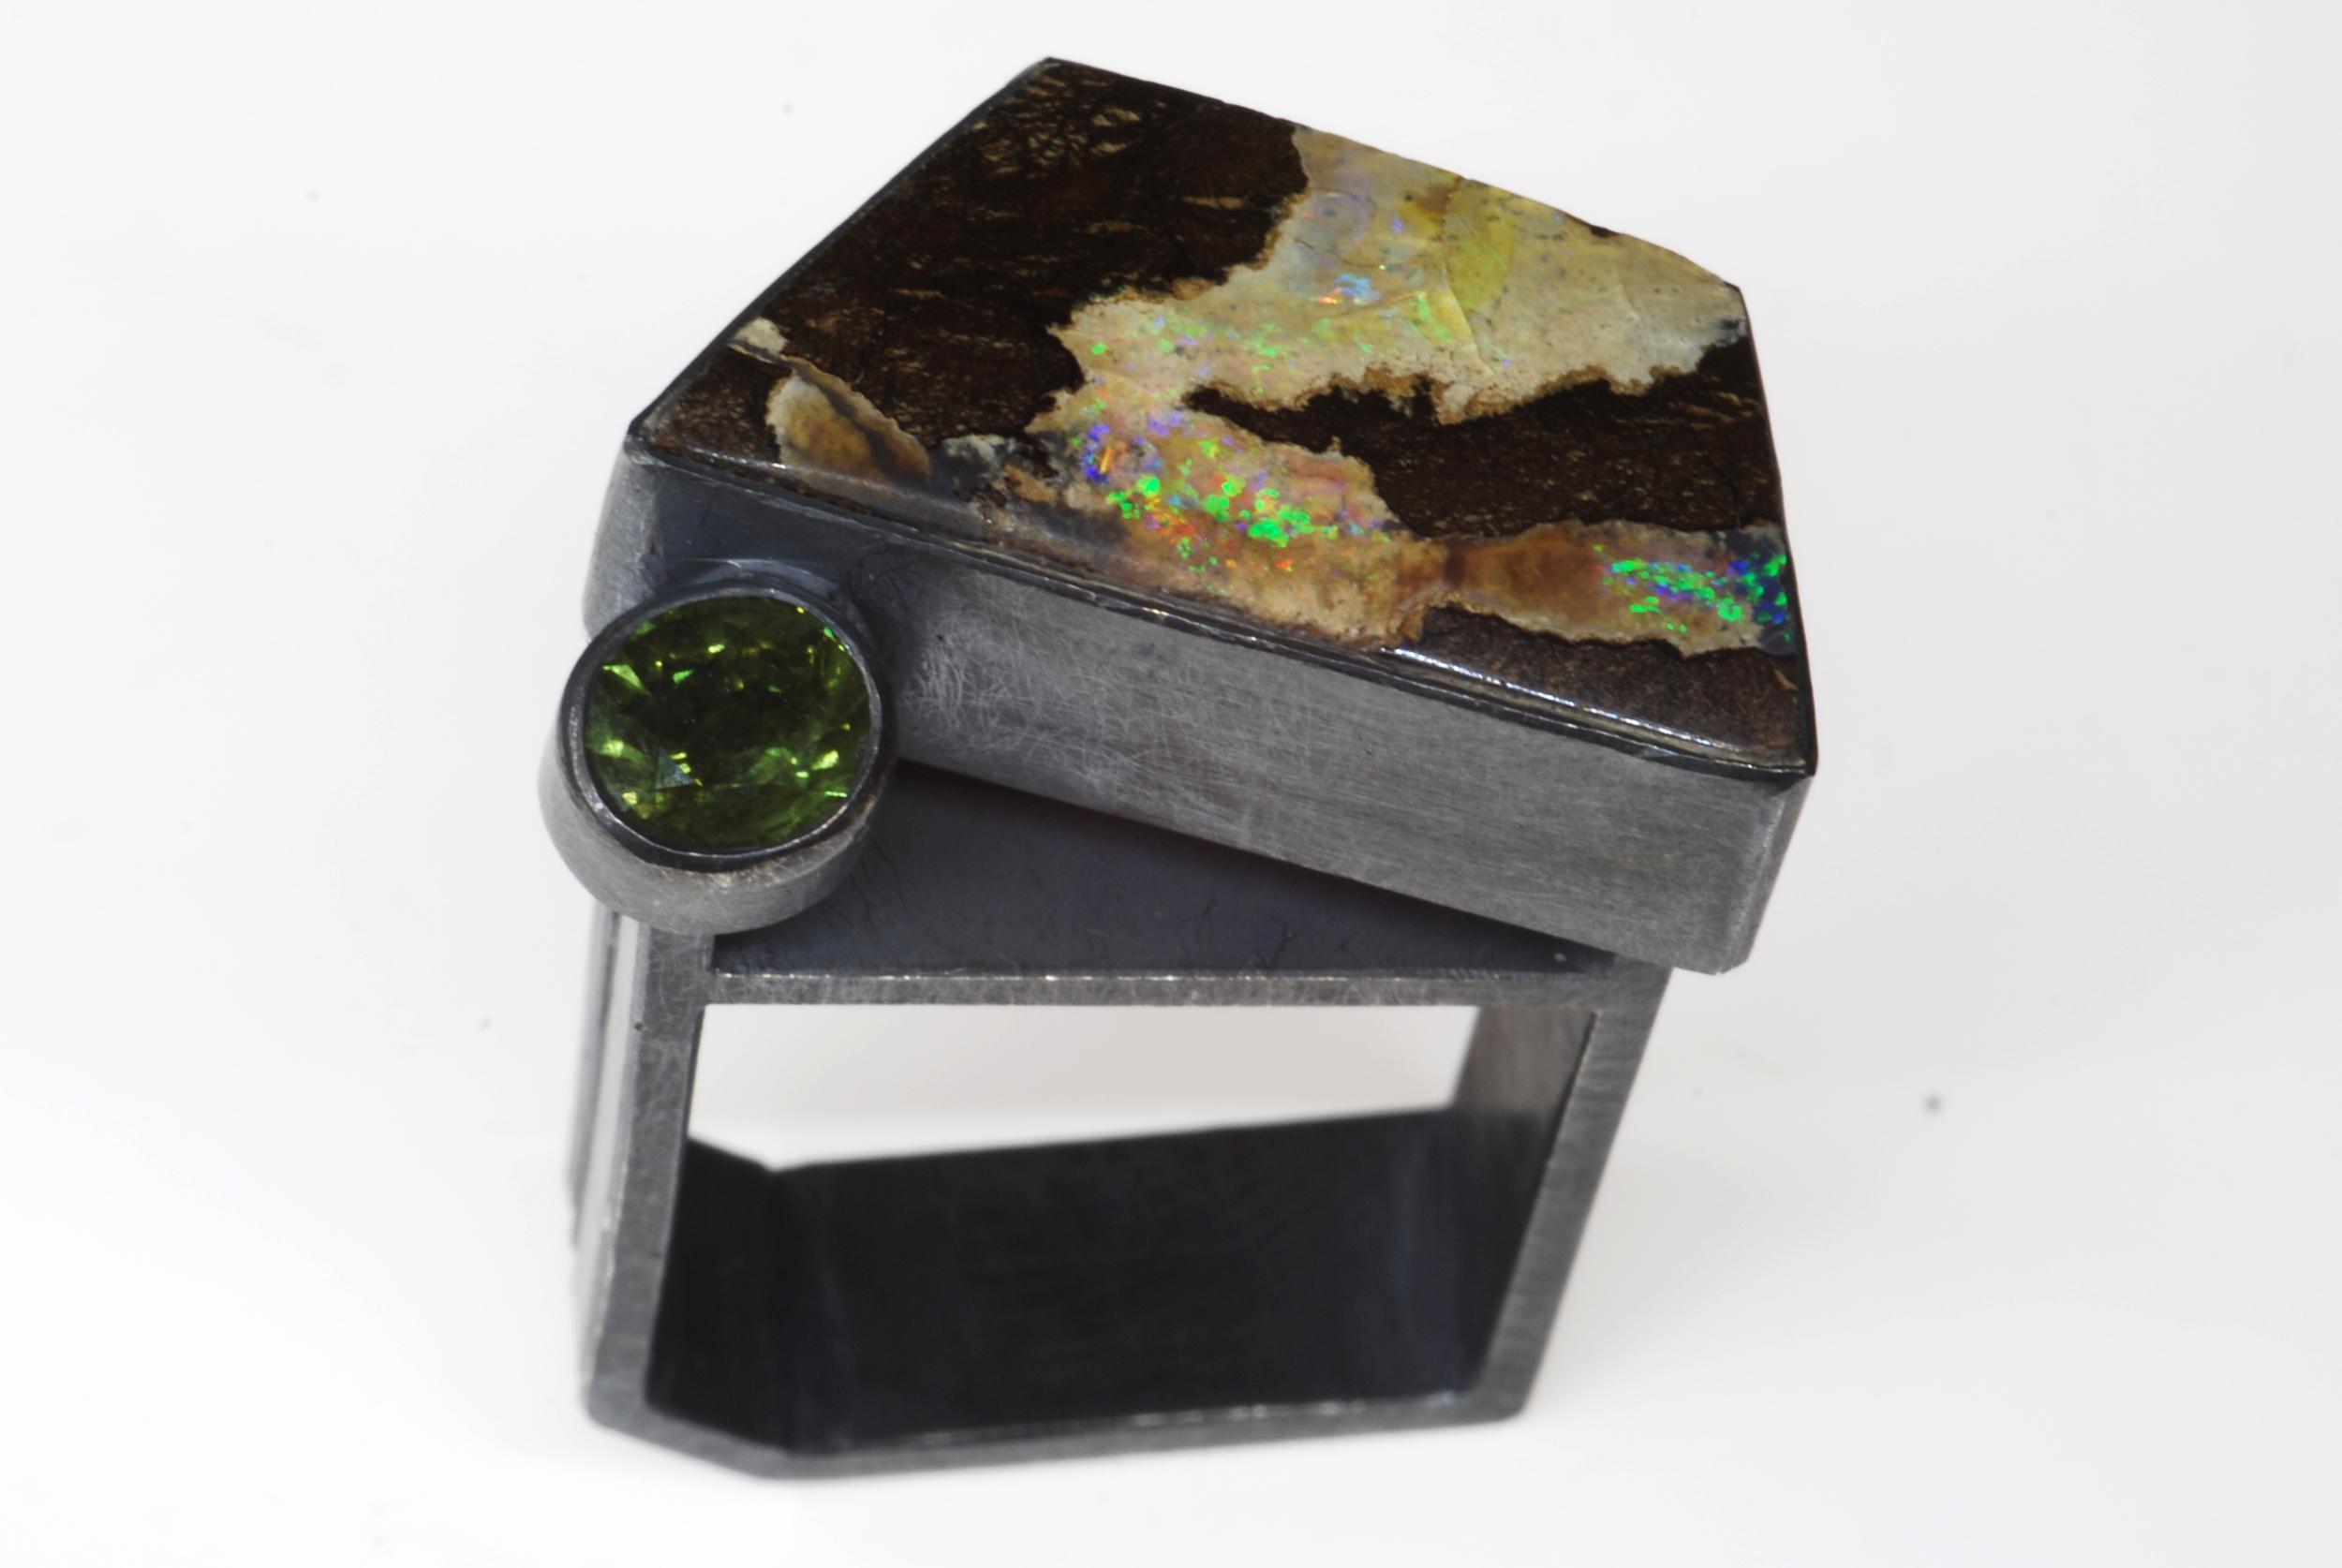 chris boland Opal Sapphire #2 9Sept15 (1).JPG